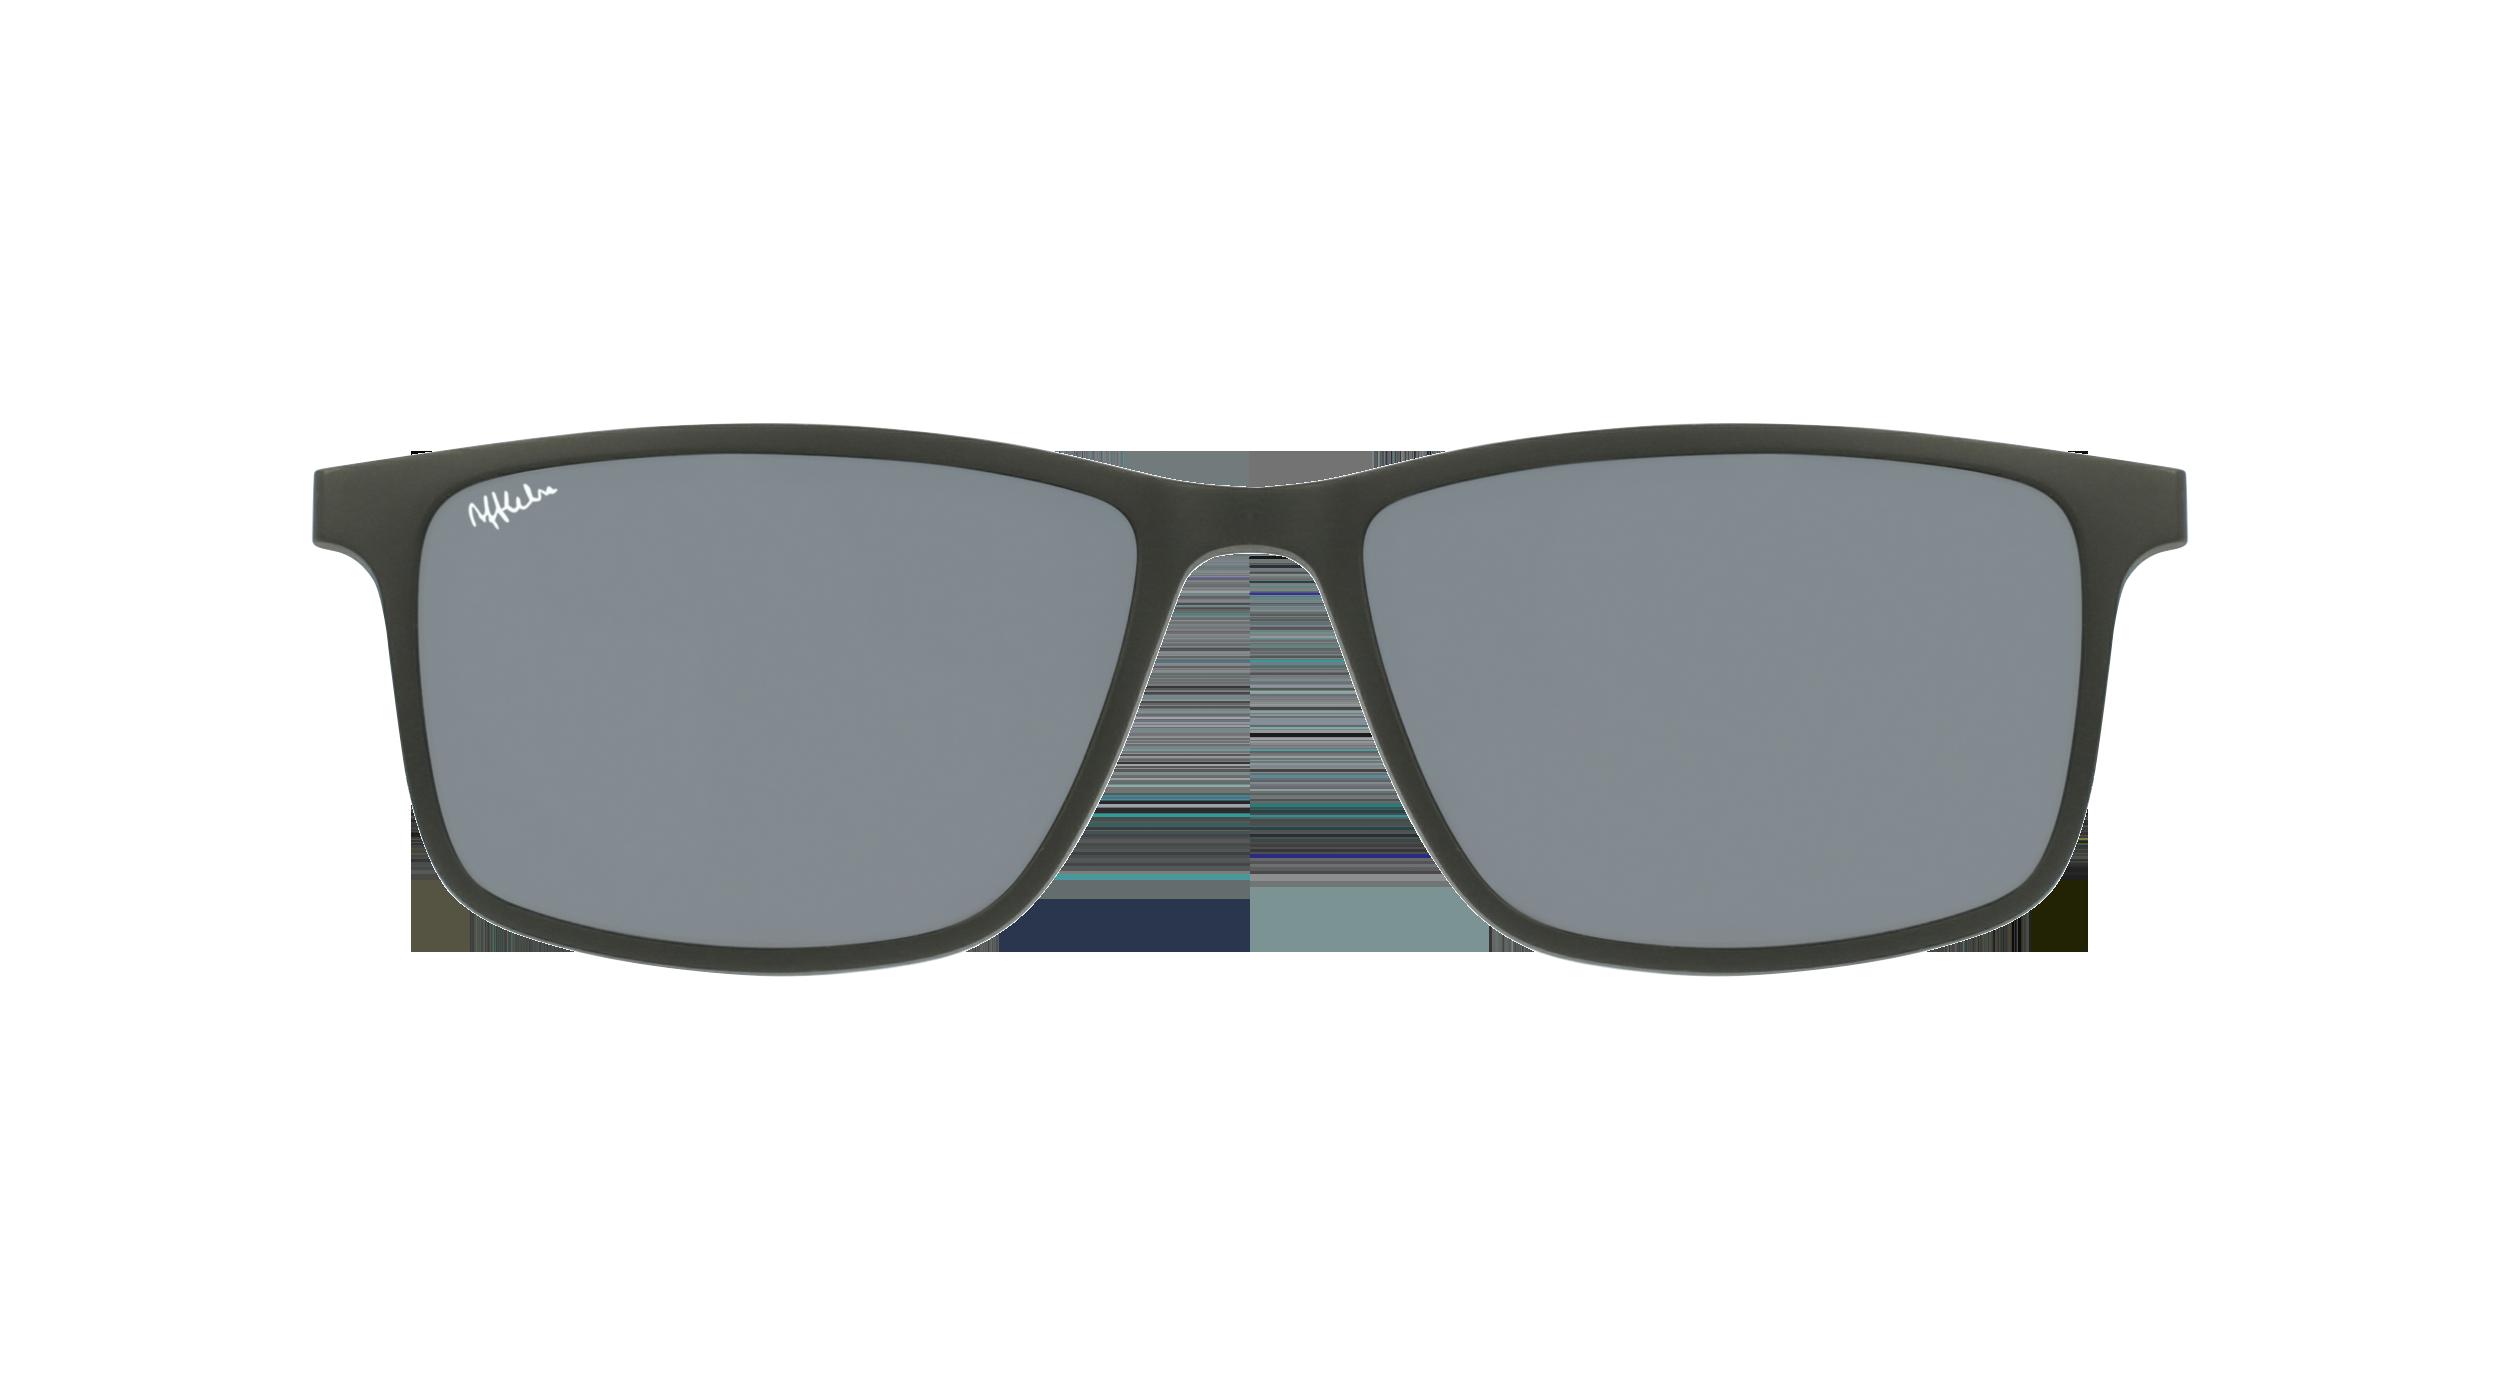 afflelou/france/products/smart_clip/clips_glasses/07630036457009.png